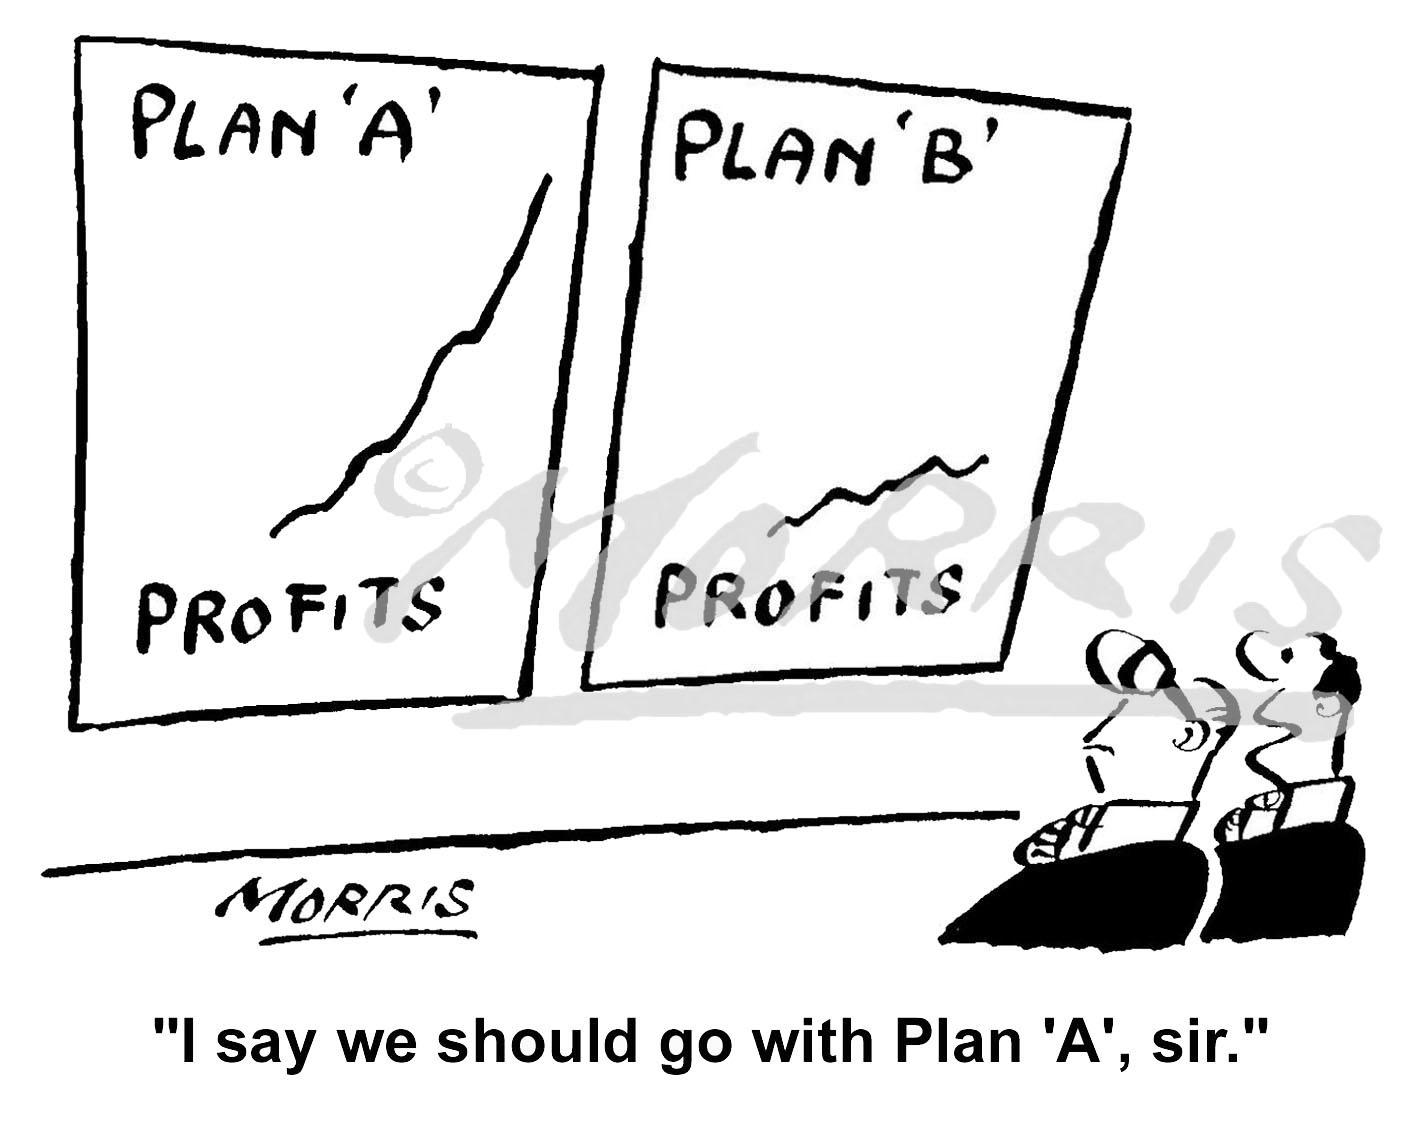 Boardroom Profits graph cartoon – Ref: 1997bw